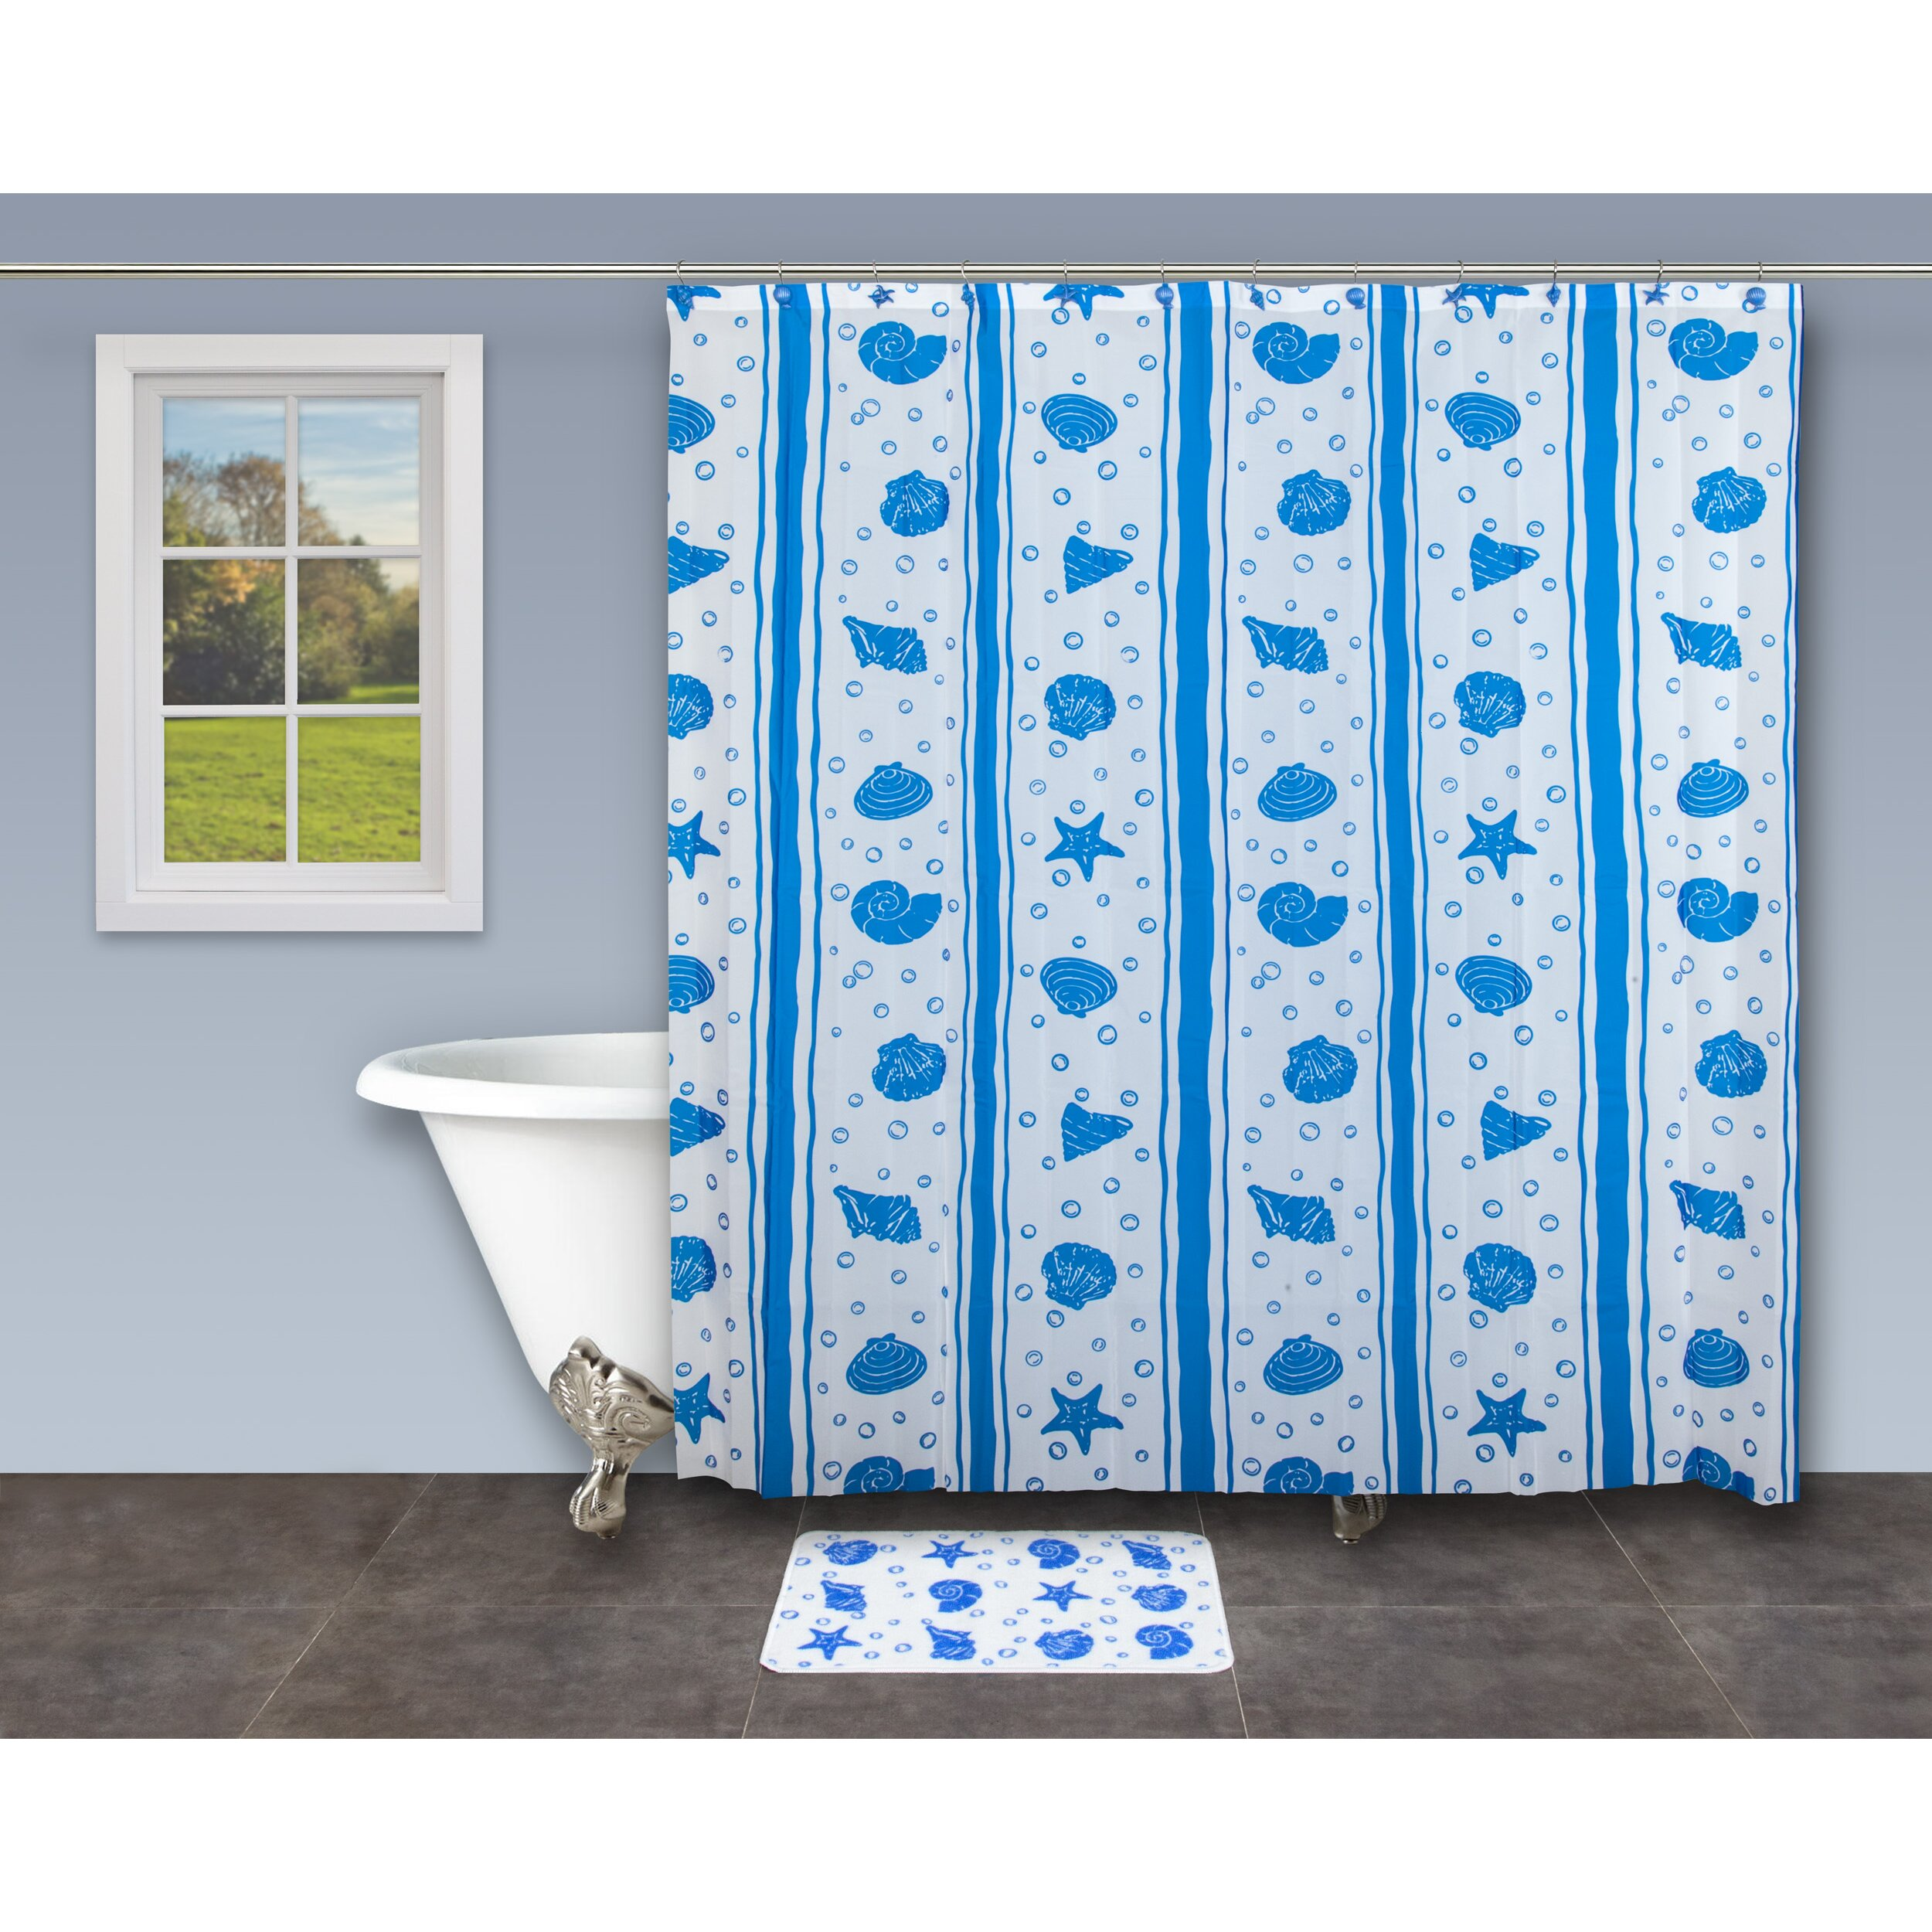 Innova Imports 18 Piece Bathroom Shower Curtain Set